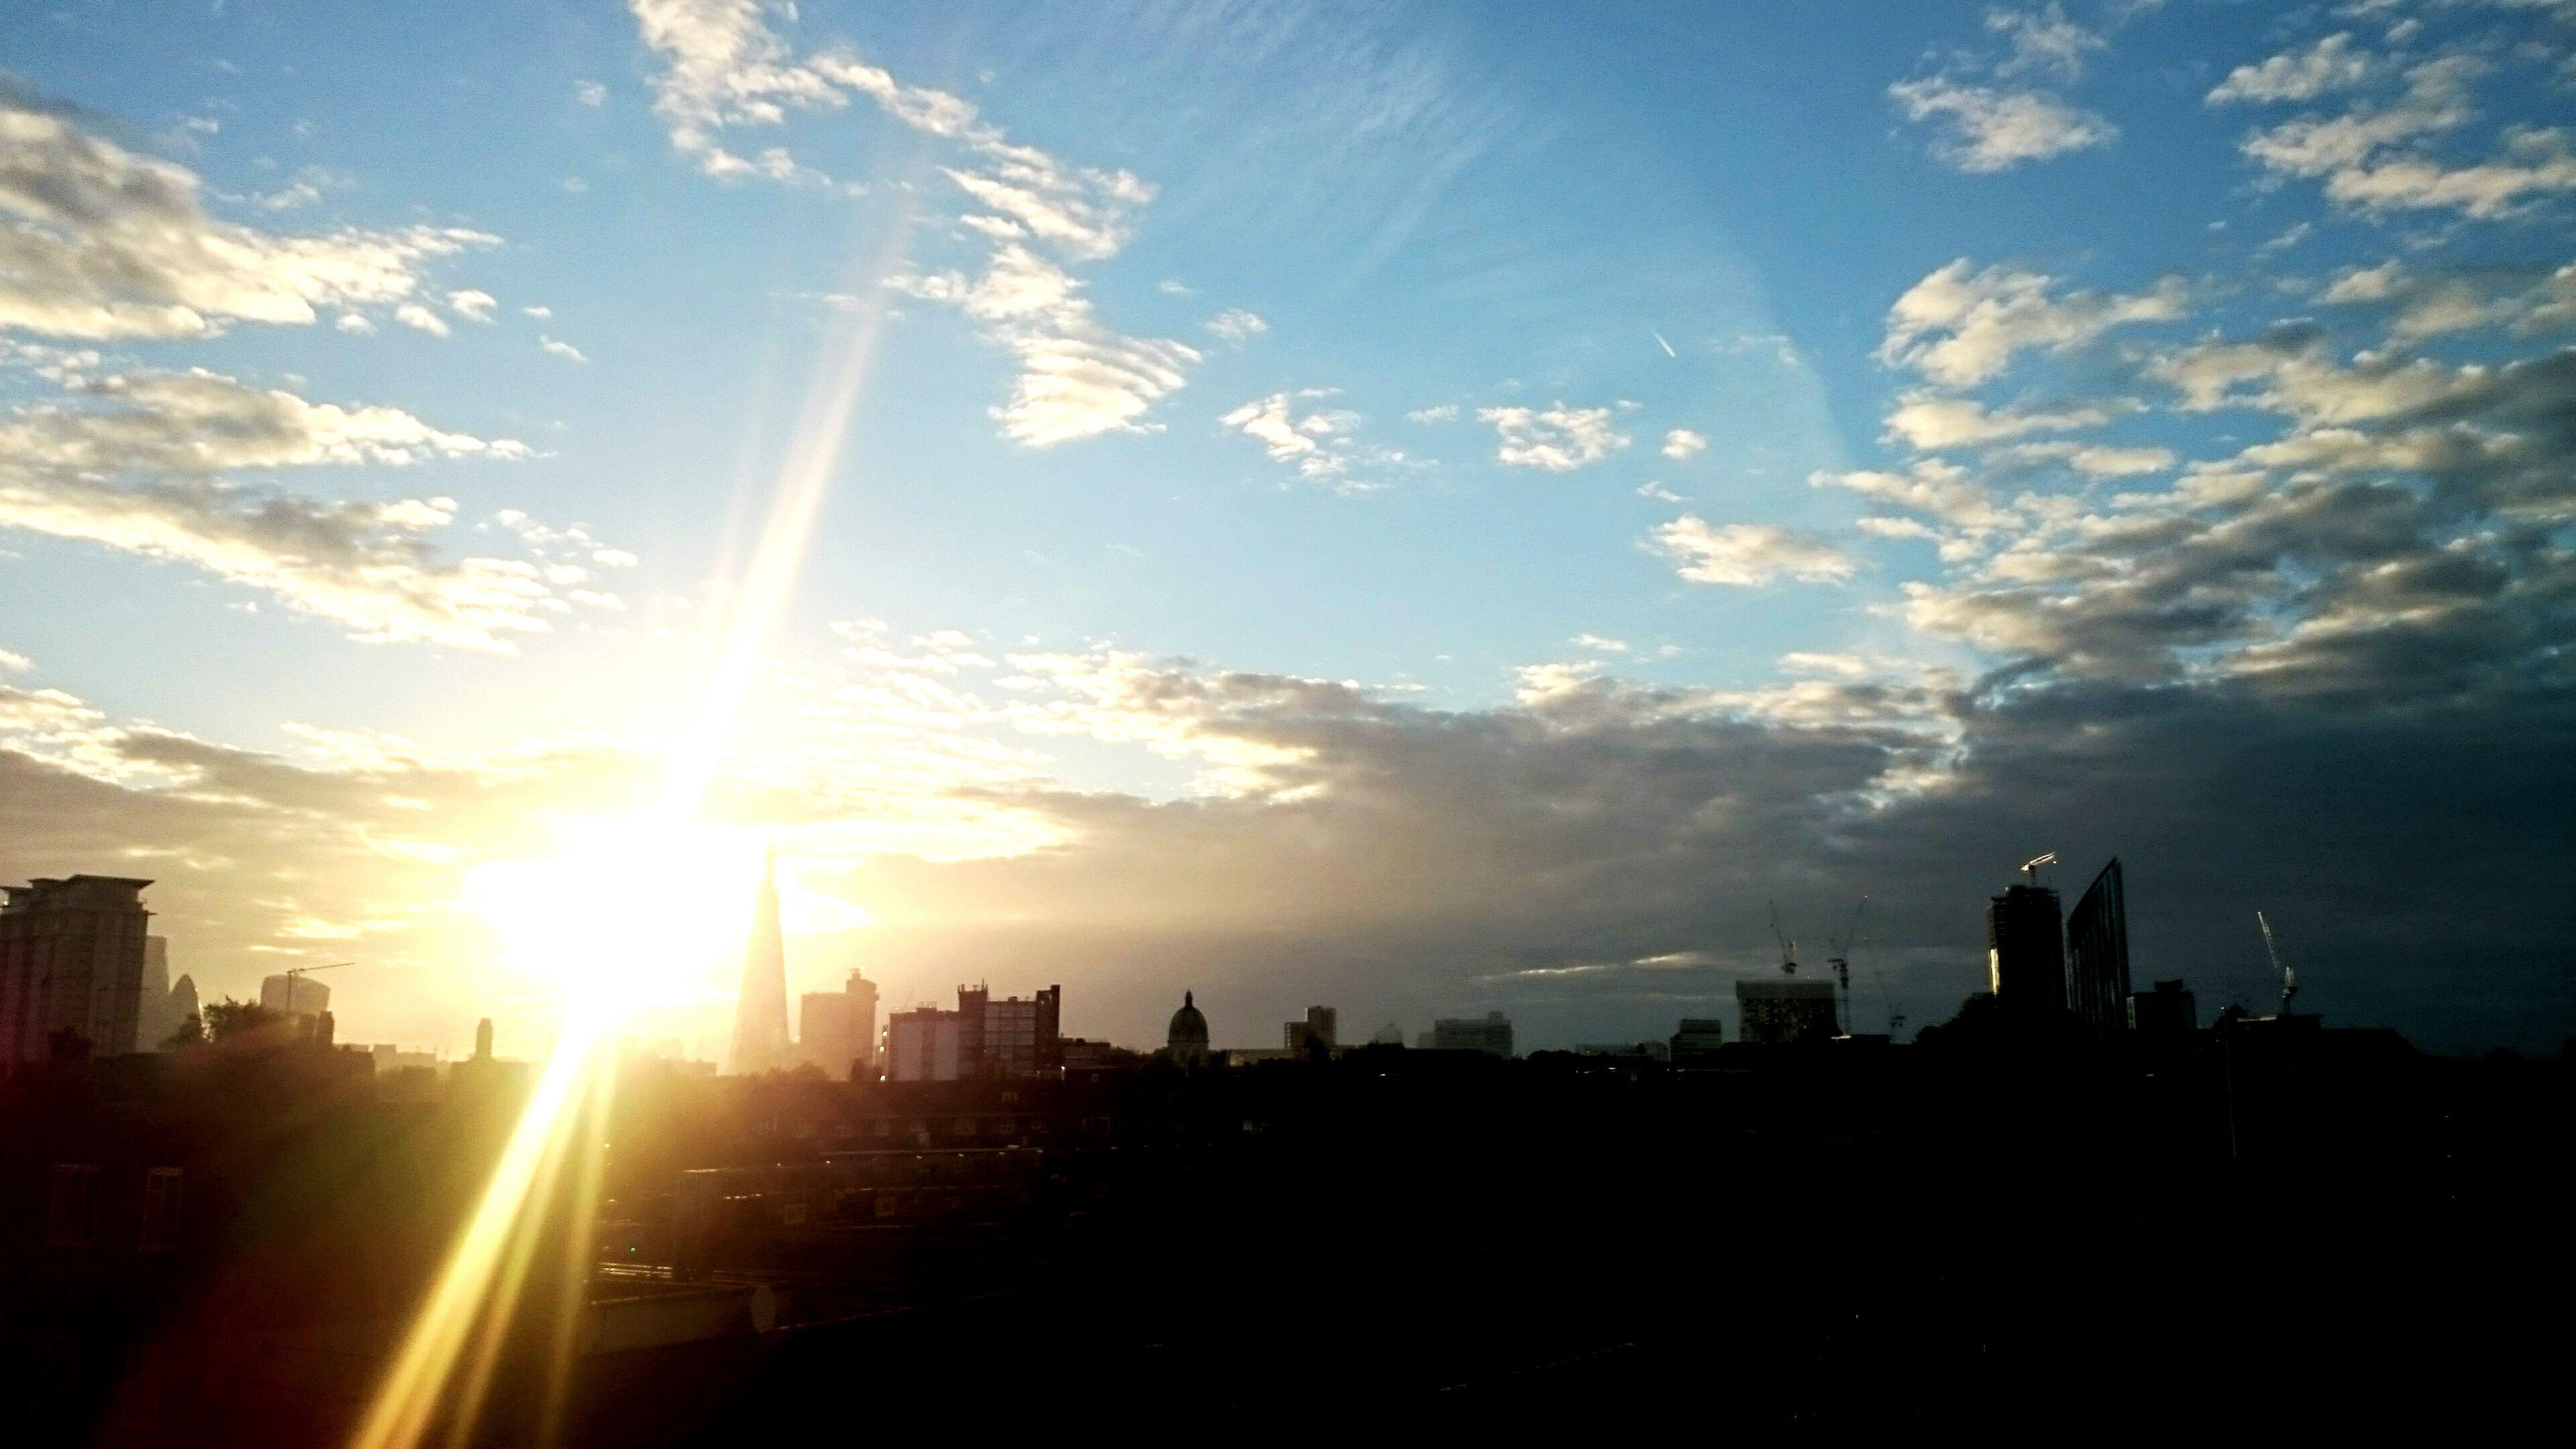 sun, building exterior, sunbeam, sunset, architecture, built structure, silhouette, sunlight, sky, city, cloud - sky, lens flare, cityscape, cloud, building, bright, skyscraper, outdoors, urban skyline, nature